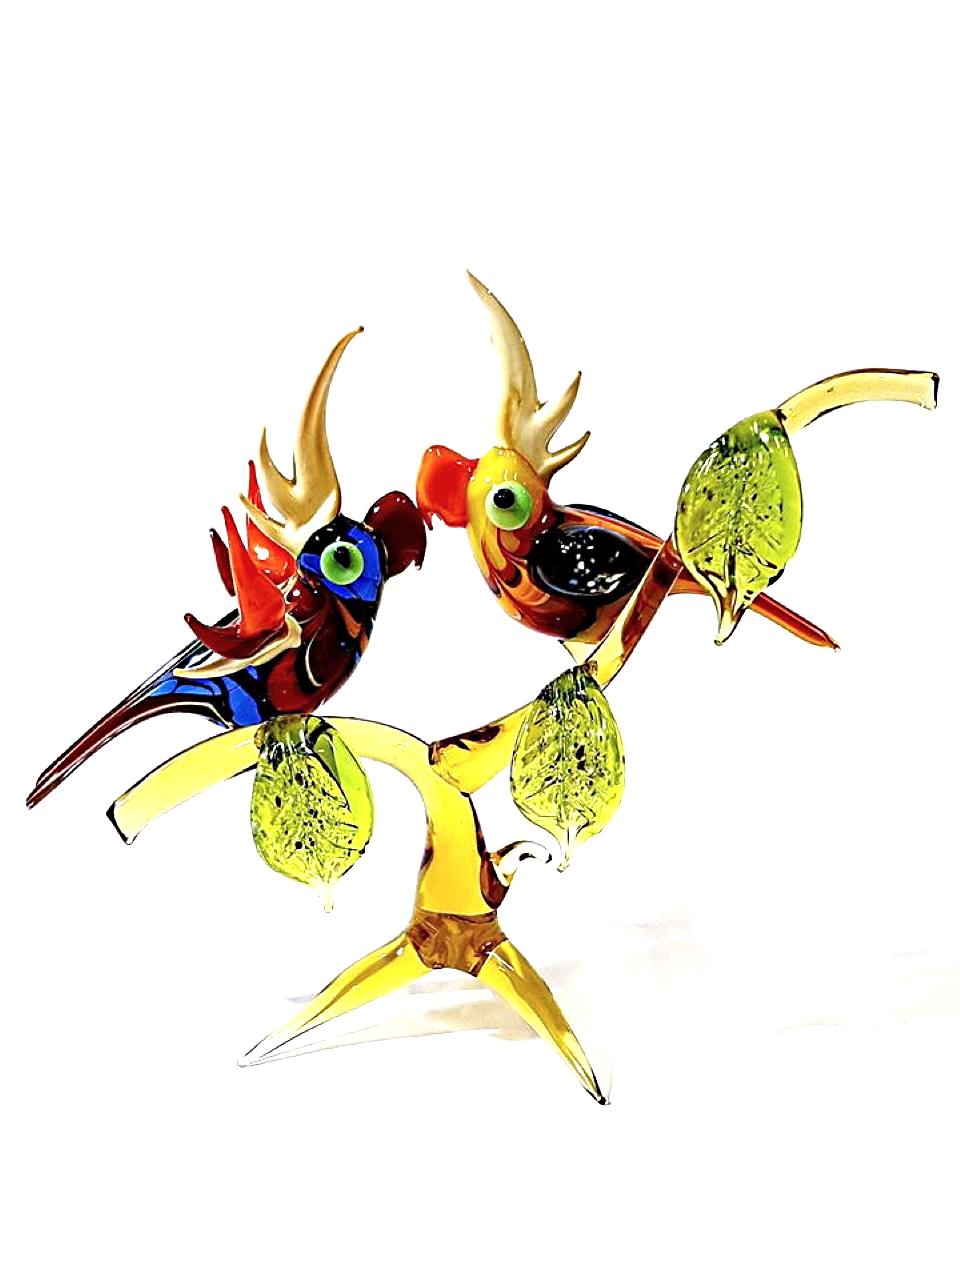 Ramo pappagalli a lume